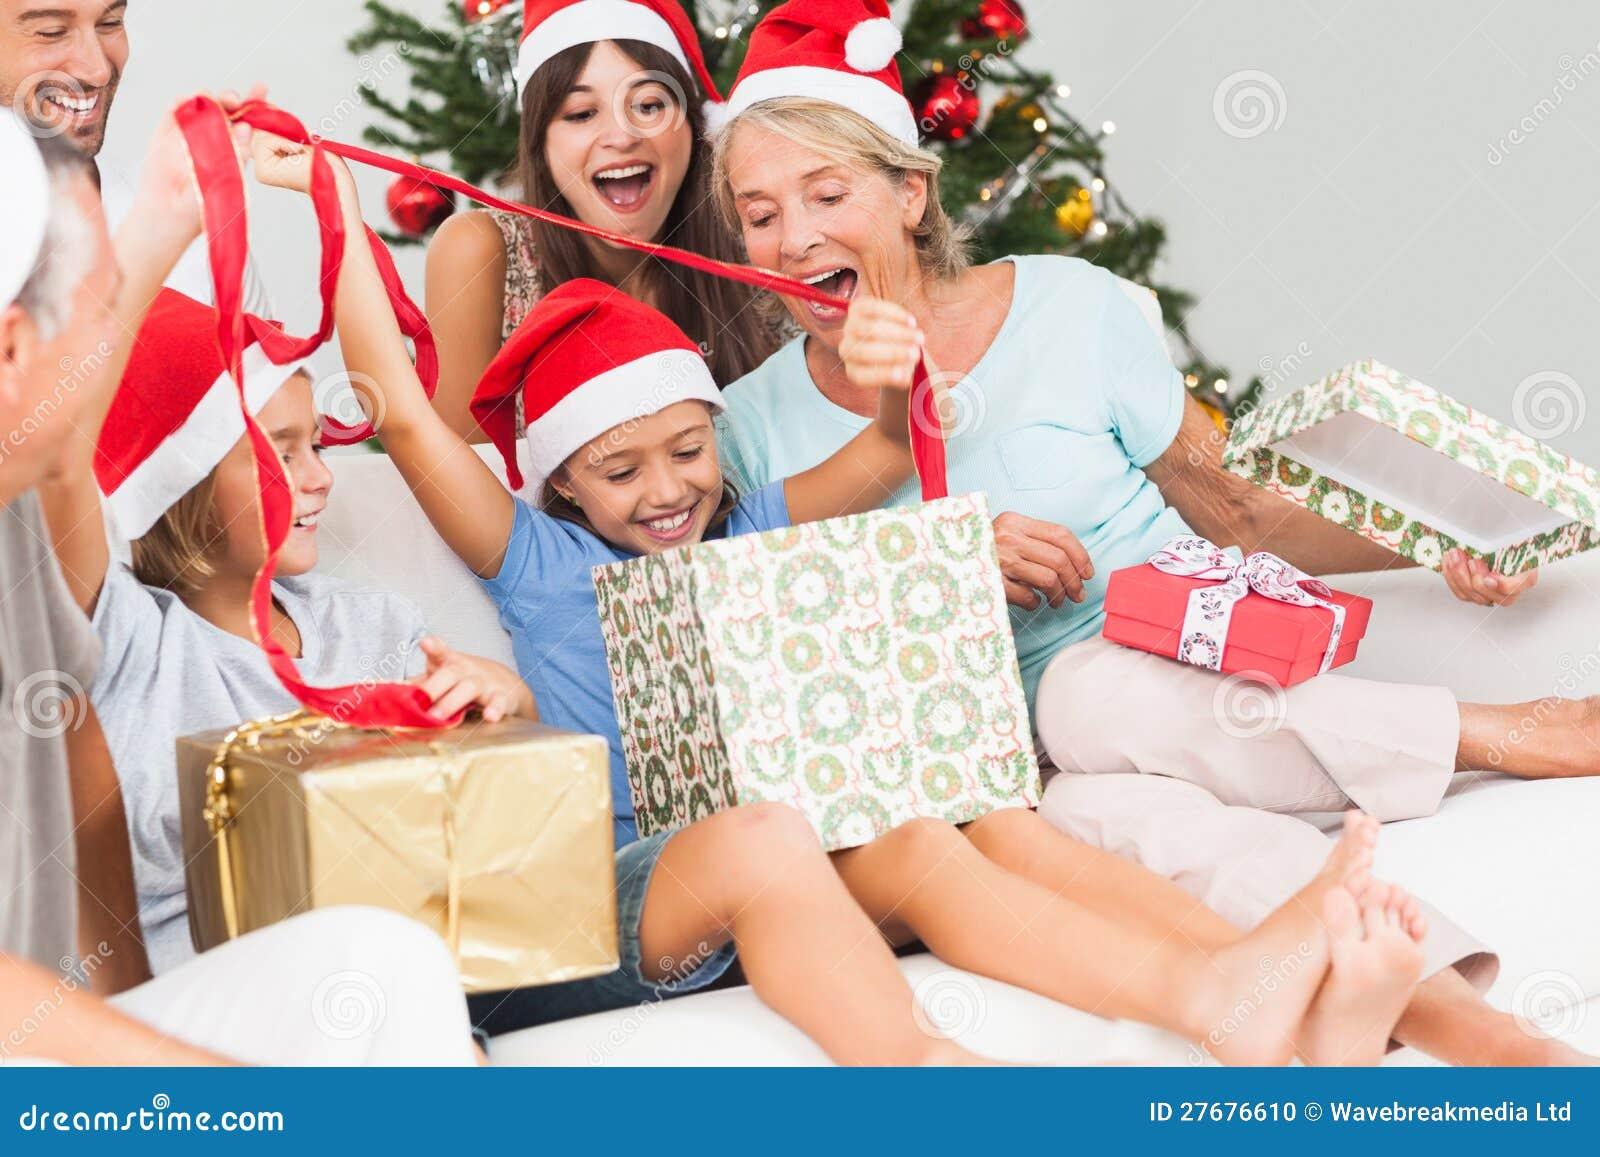 Regali Di Natale Famiglia.Famiglia Felice Ai Regali Di Apertura Di Natale Insieme